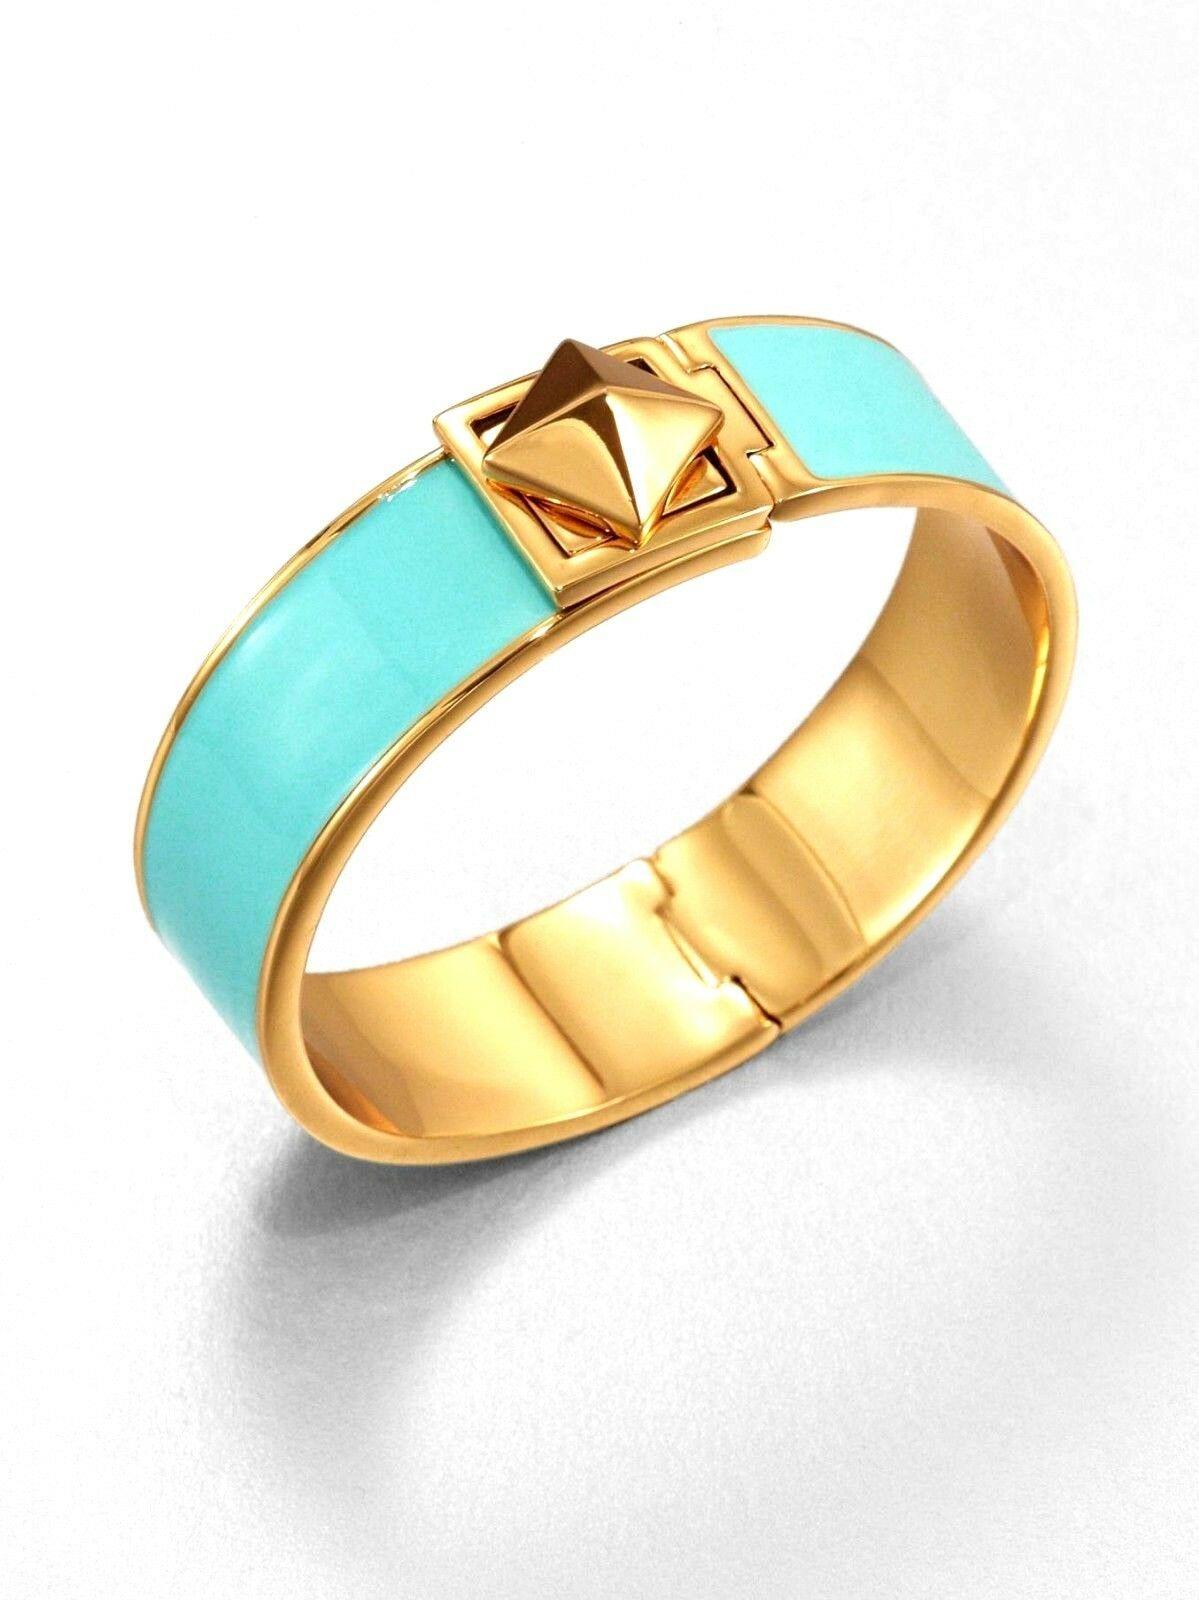 Buy Kate Spade light green Hinge Bracelet from abroad